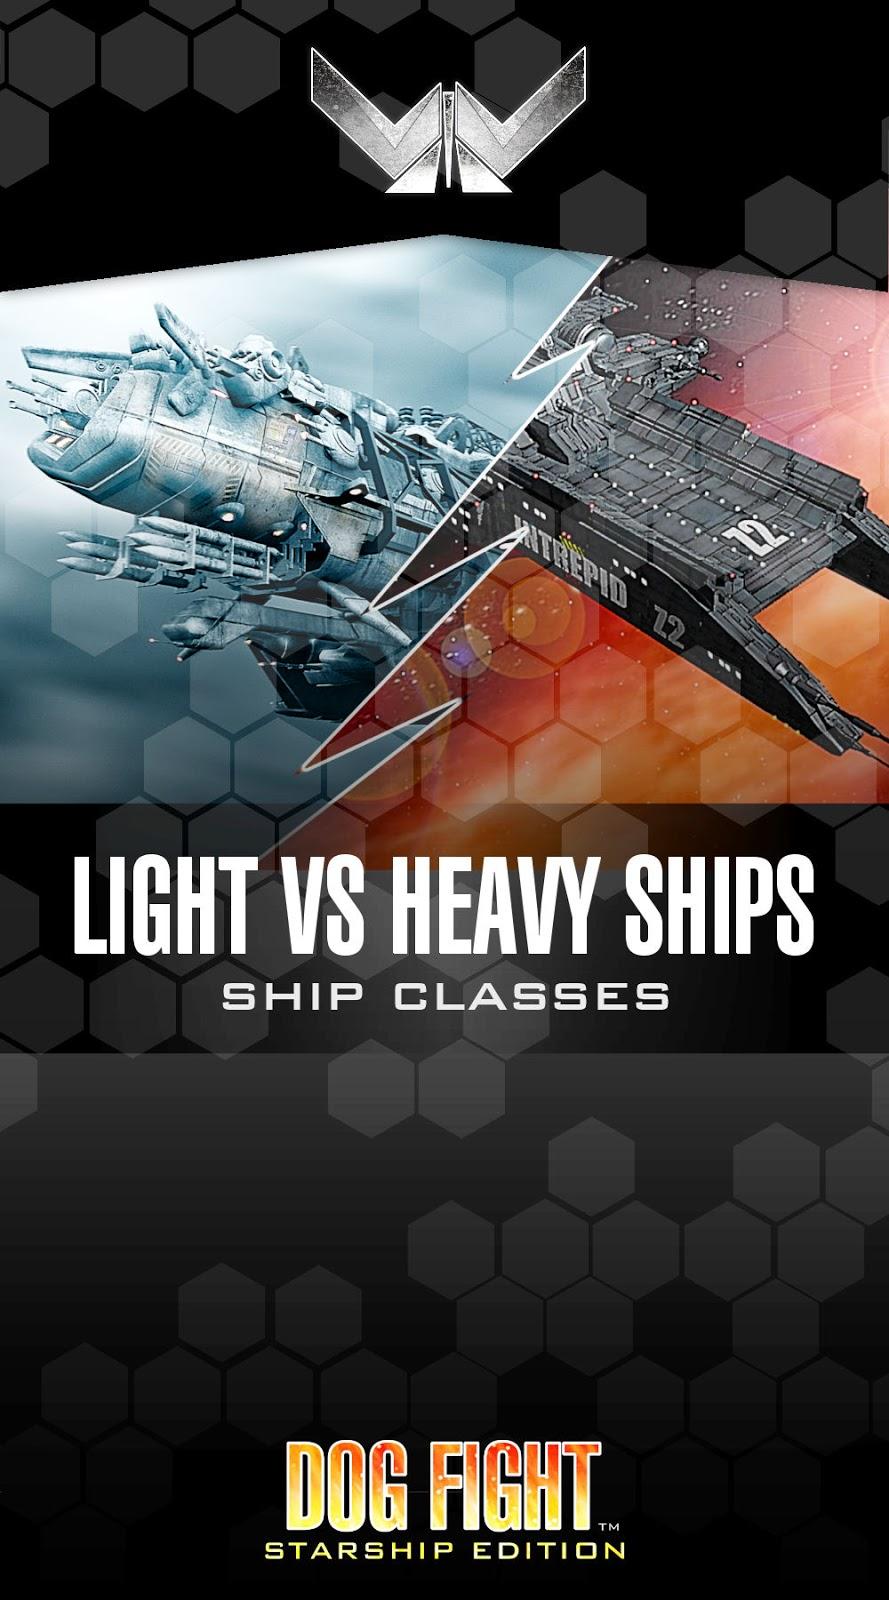 Dog Fight: Starship Edition light ships heavy ships